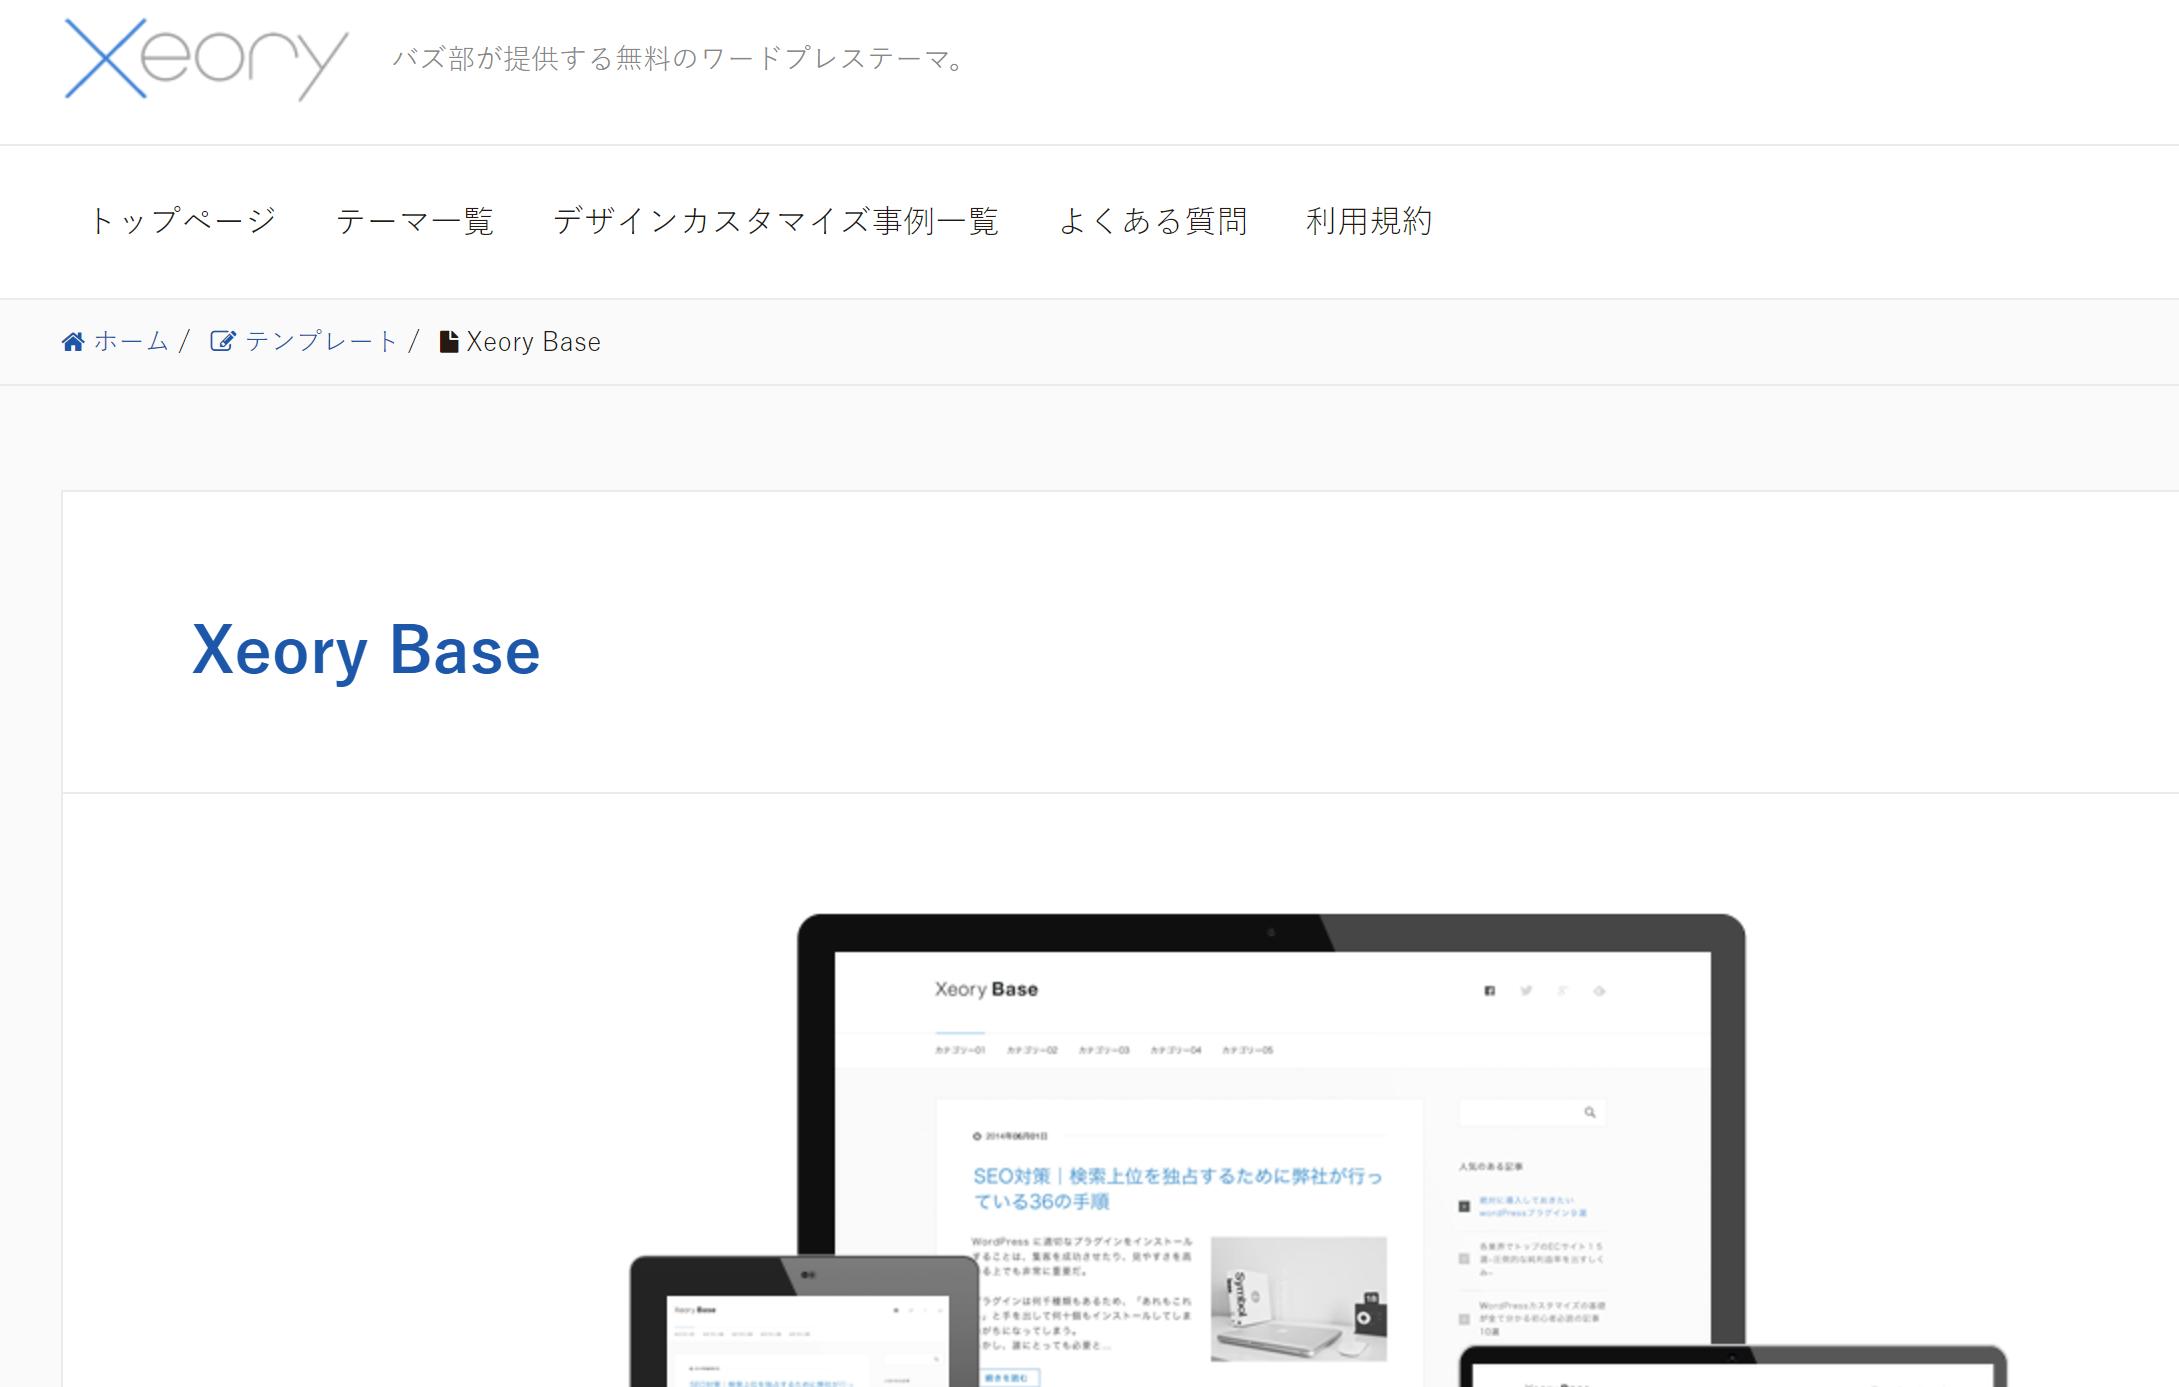 xeory base - WordPressでレスポンシブデザインにする方法!CSS編集やおすすめのテーマまとめ